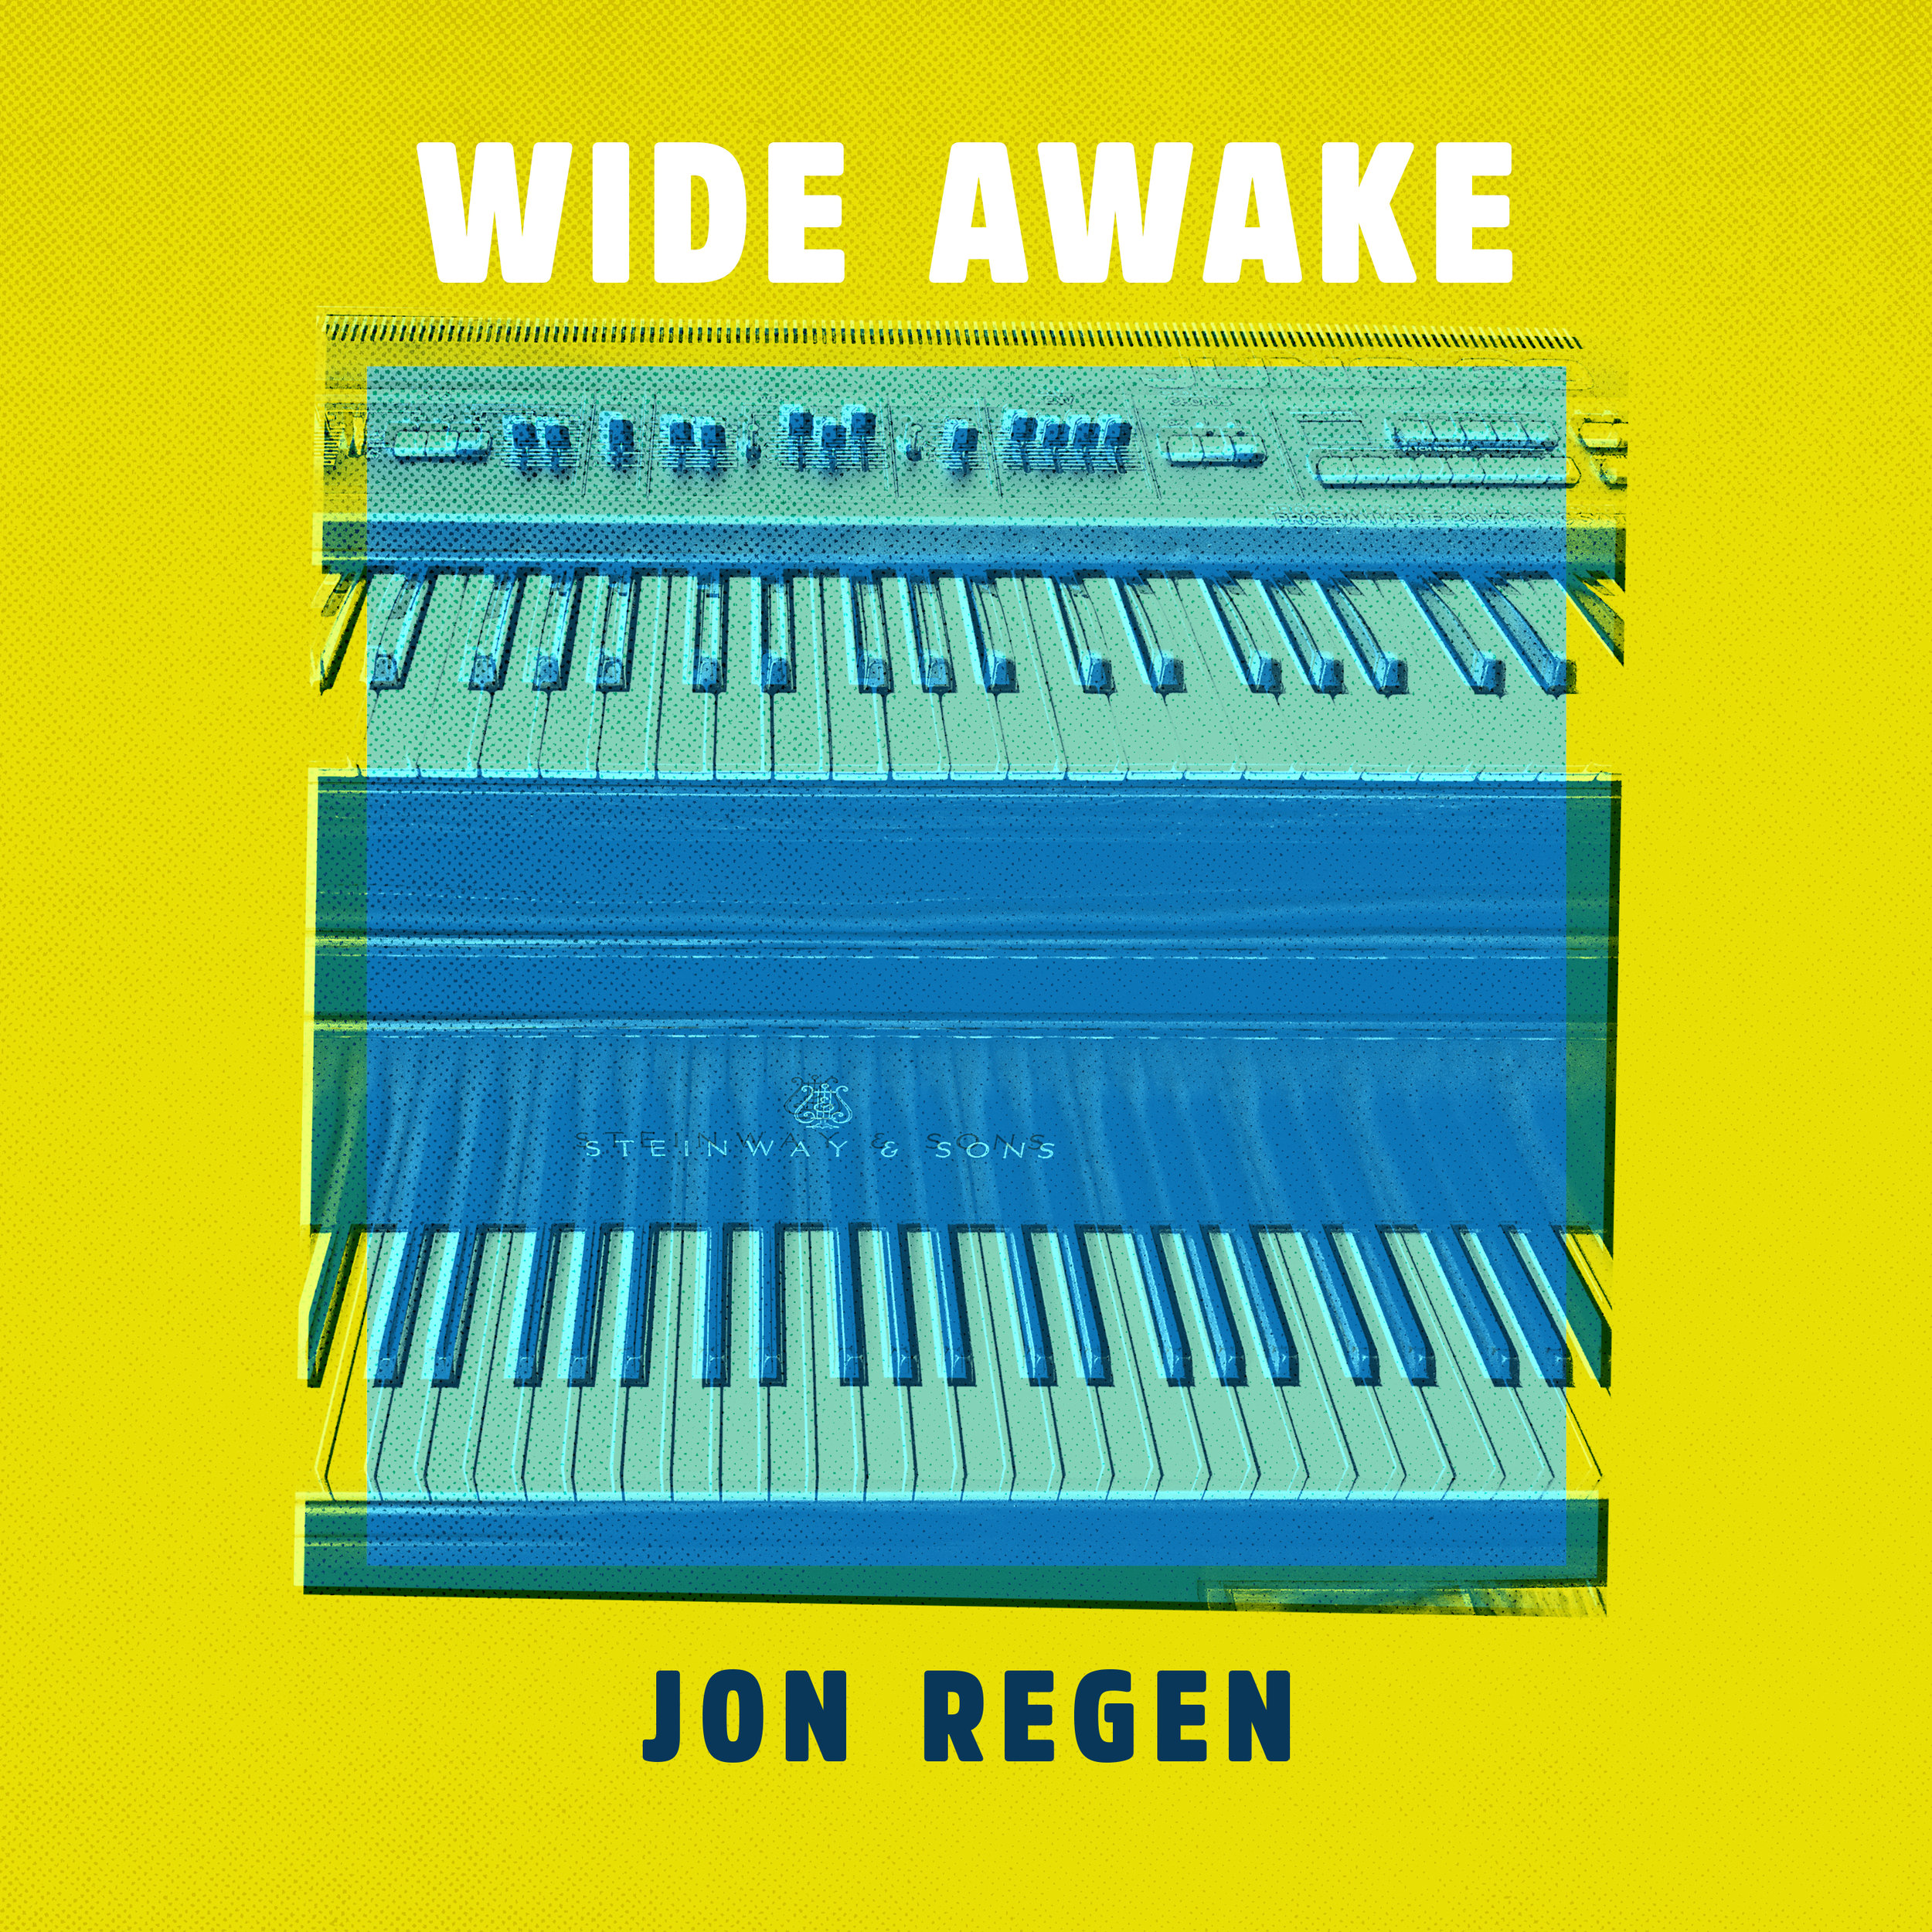 Wide Awake Cover Art.jpg